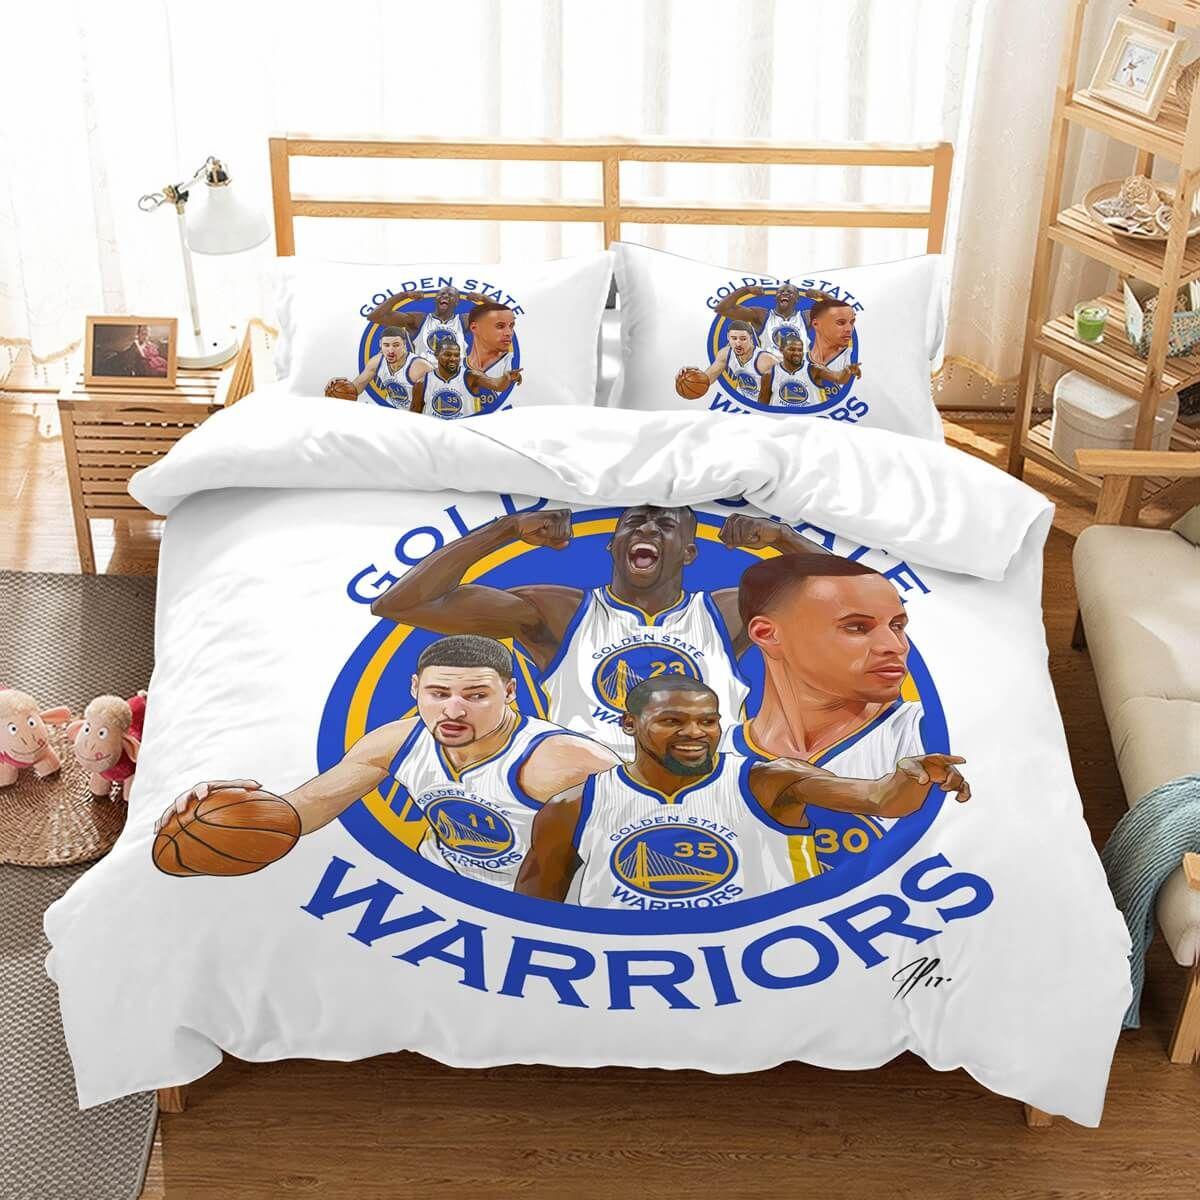 3d Customize Golden State Warriors Bedding Set Duvet Cover Set Bedroom Set Bedlinen Basketball Bedroom Golden State Warriors Bedroom Duvet Bedding Sets